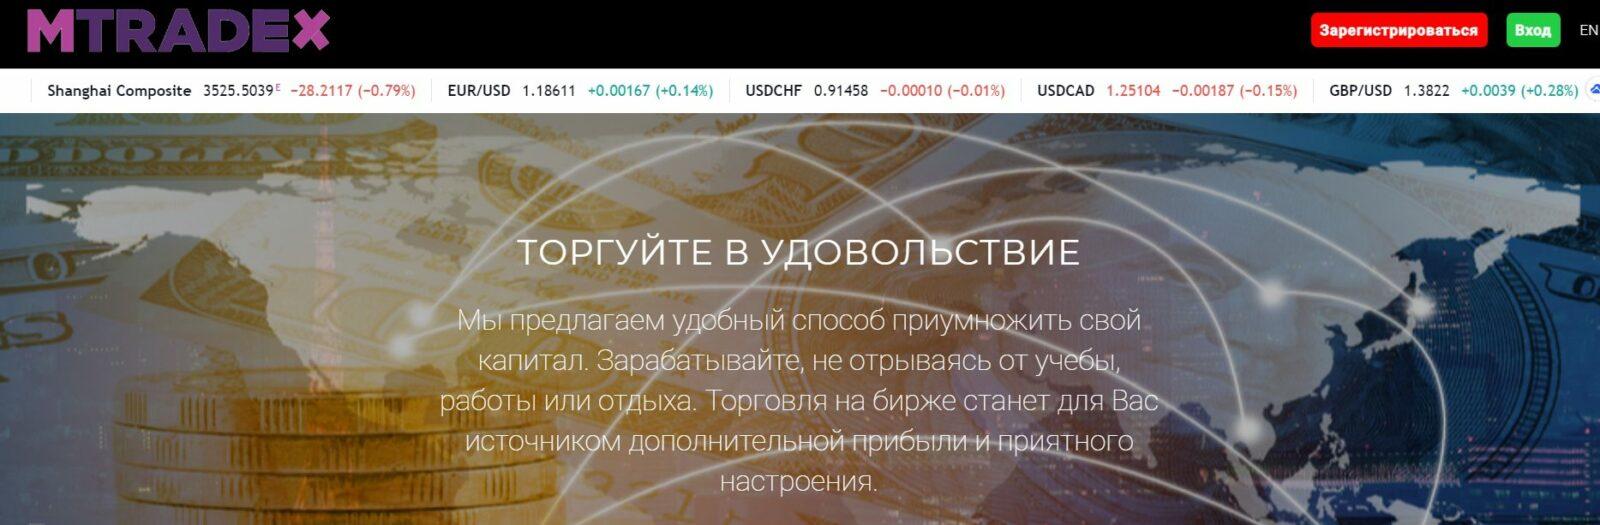 Сайт MTrade-x